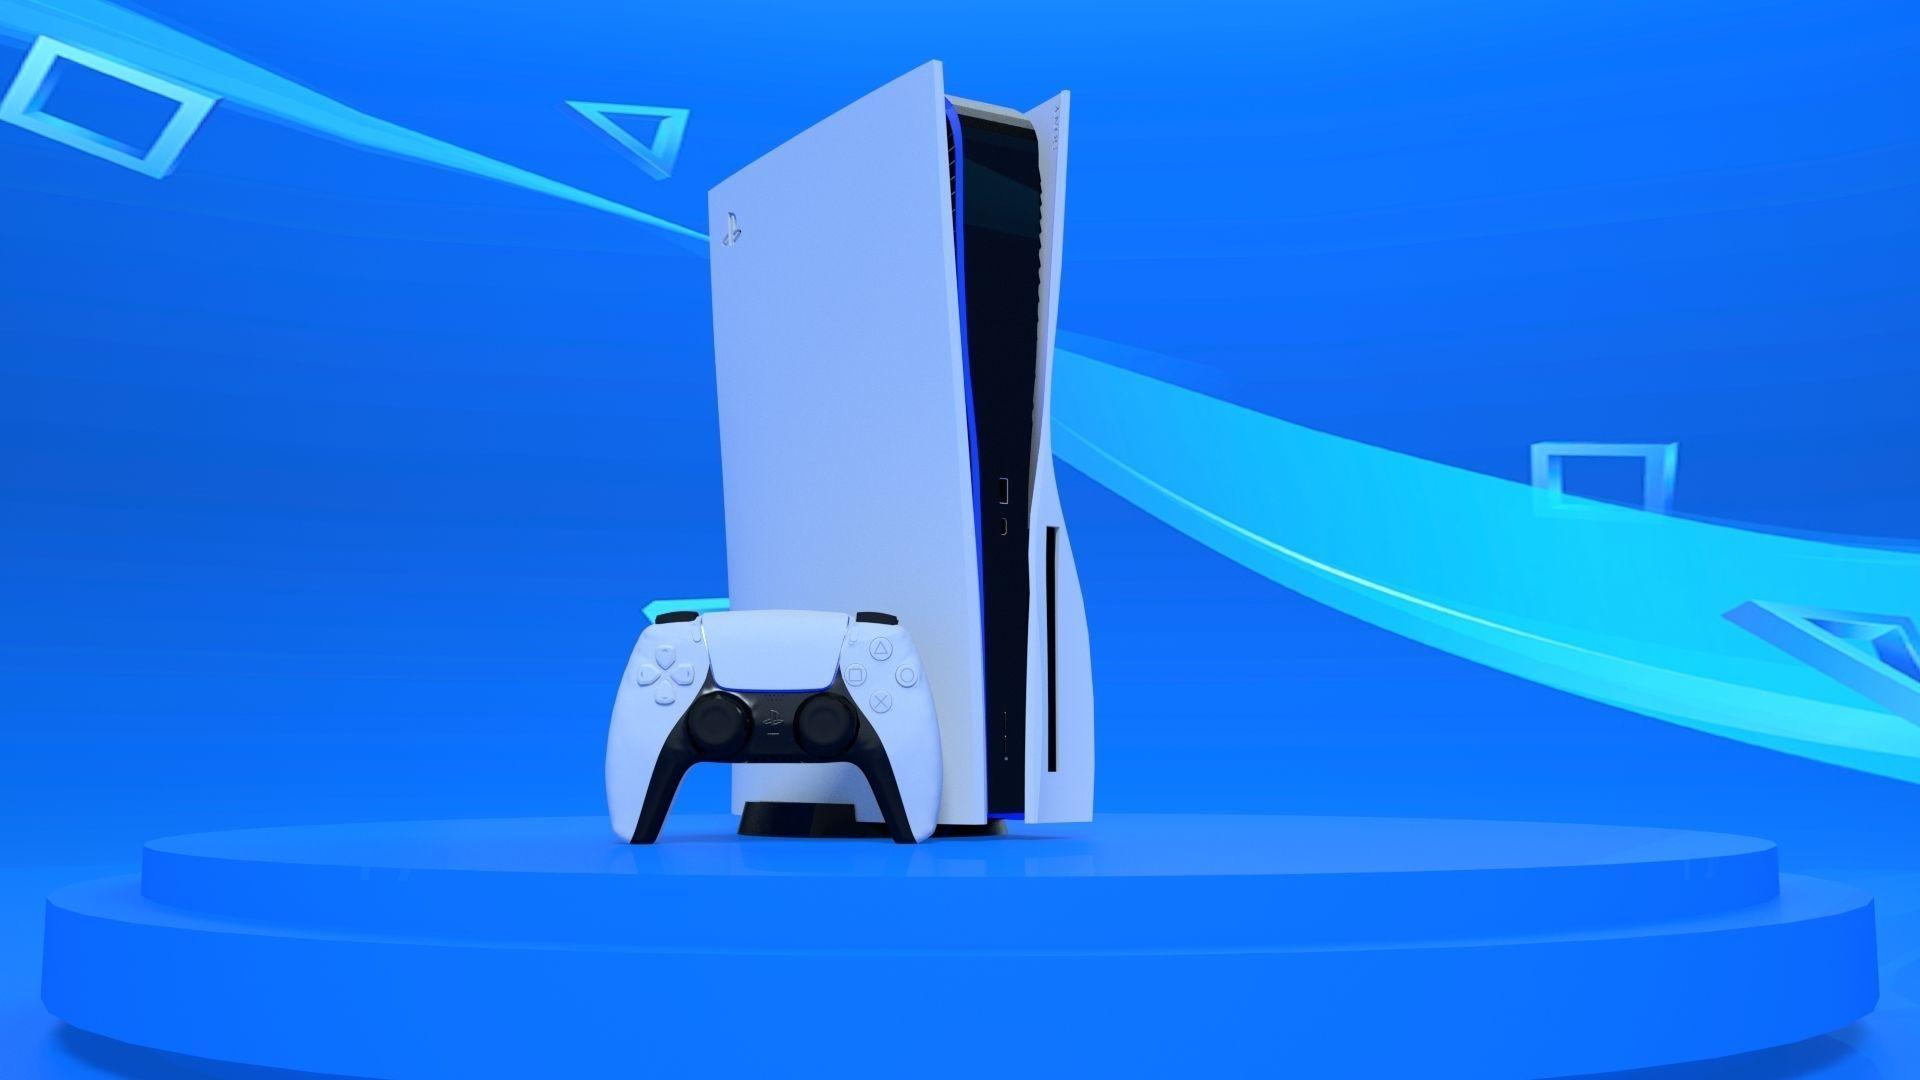 PlayStation 5 rupture